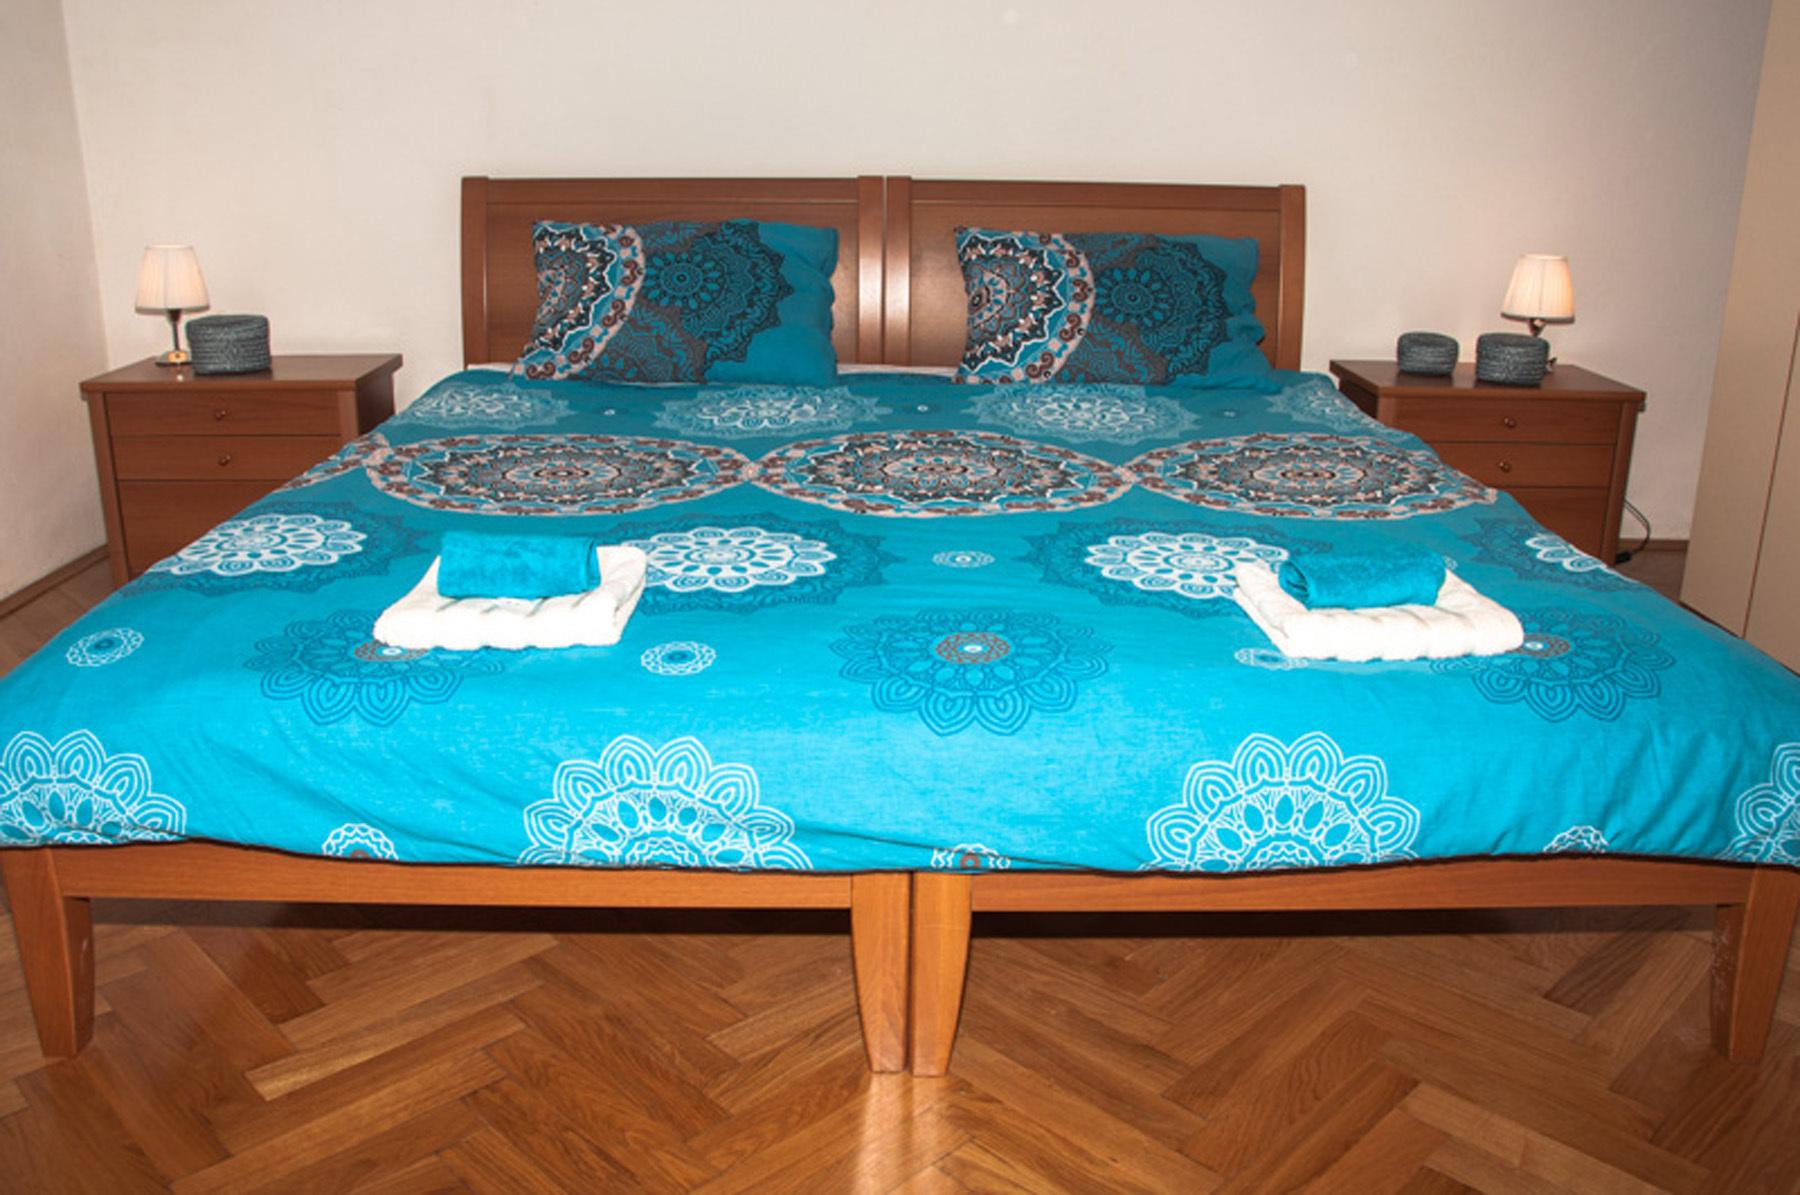 Aпартамент Apartment Pupa A2 Mihael Petrcane, Zadar riviera 51419, Petrčane, , Задар